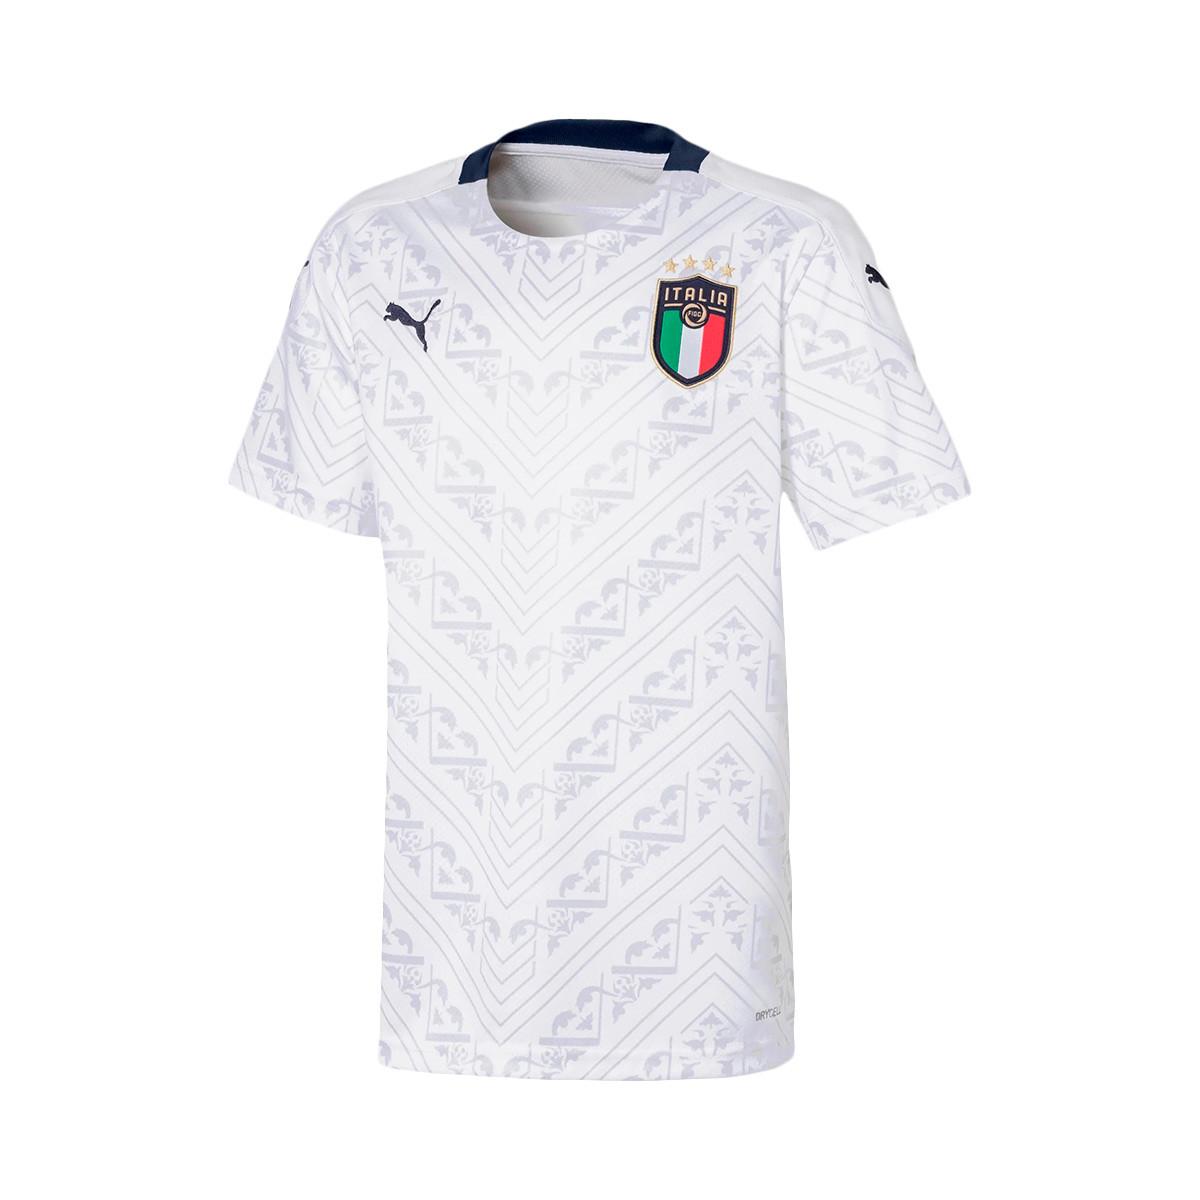 Maglia Puma FIGC Away Shirt Replica Niño